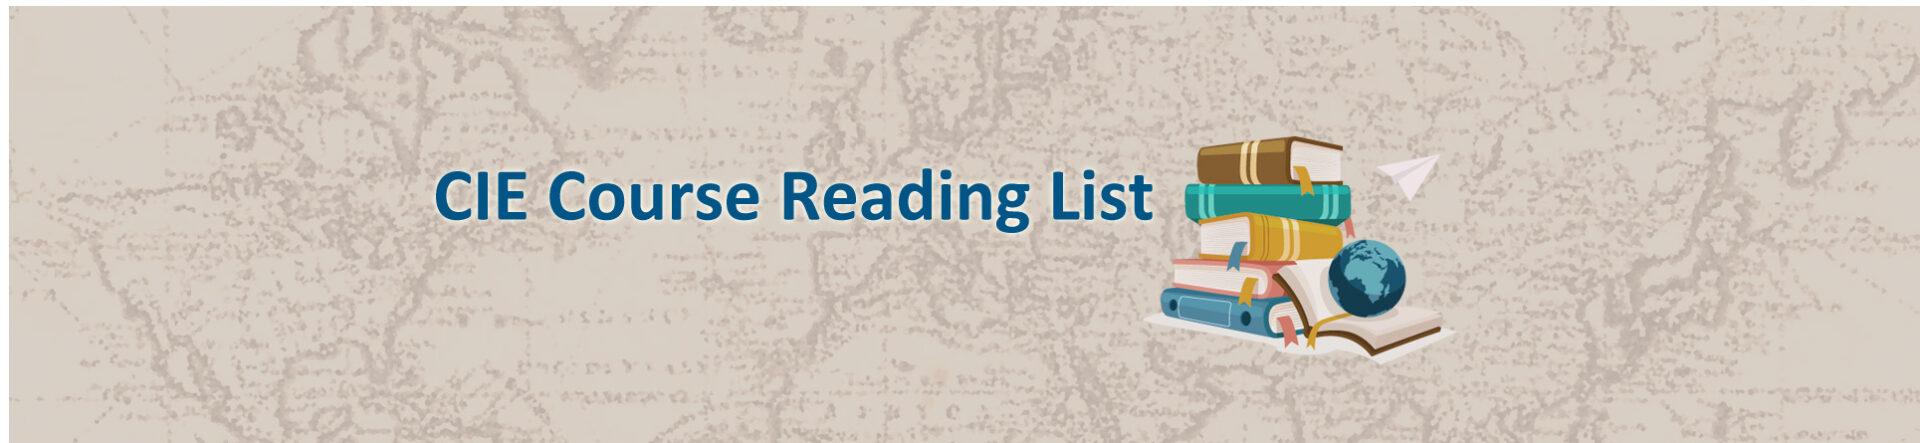 CIE Course Reading List